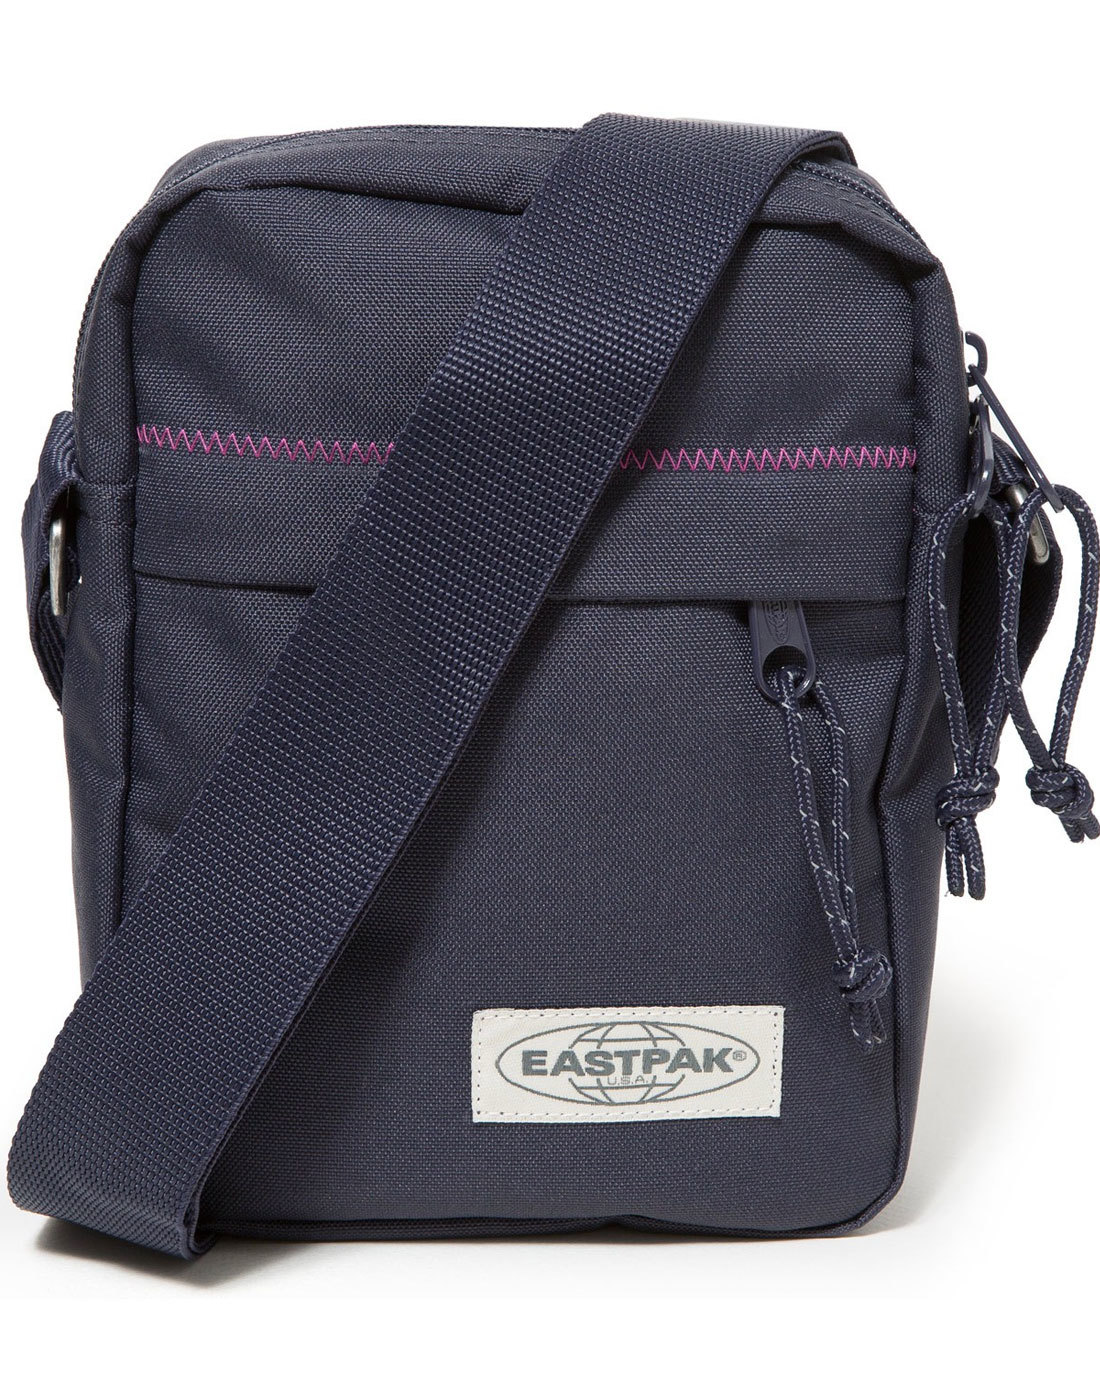 The One EASTPAK Retro Navy Stitched Zip Mini Bag